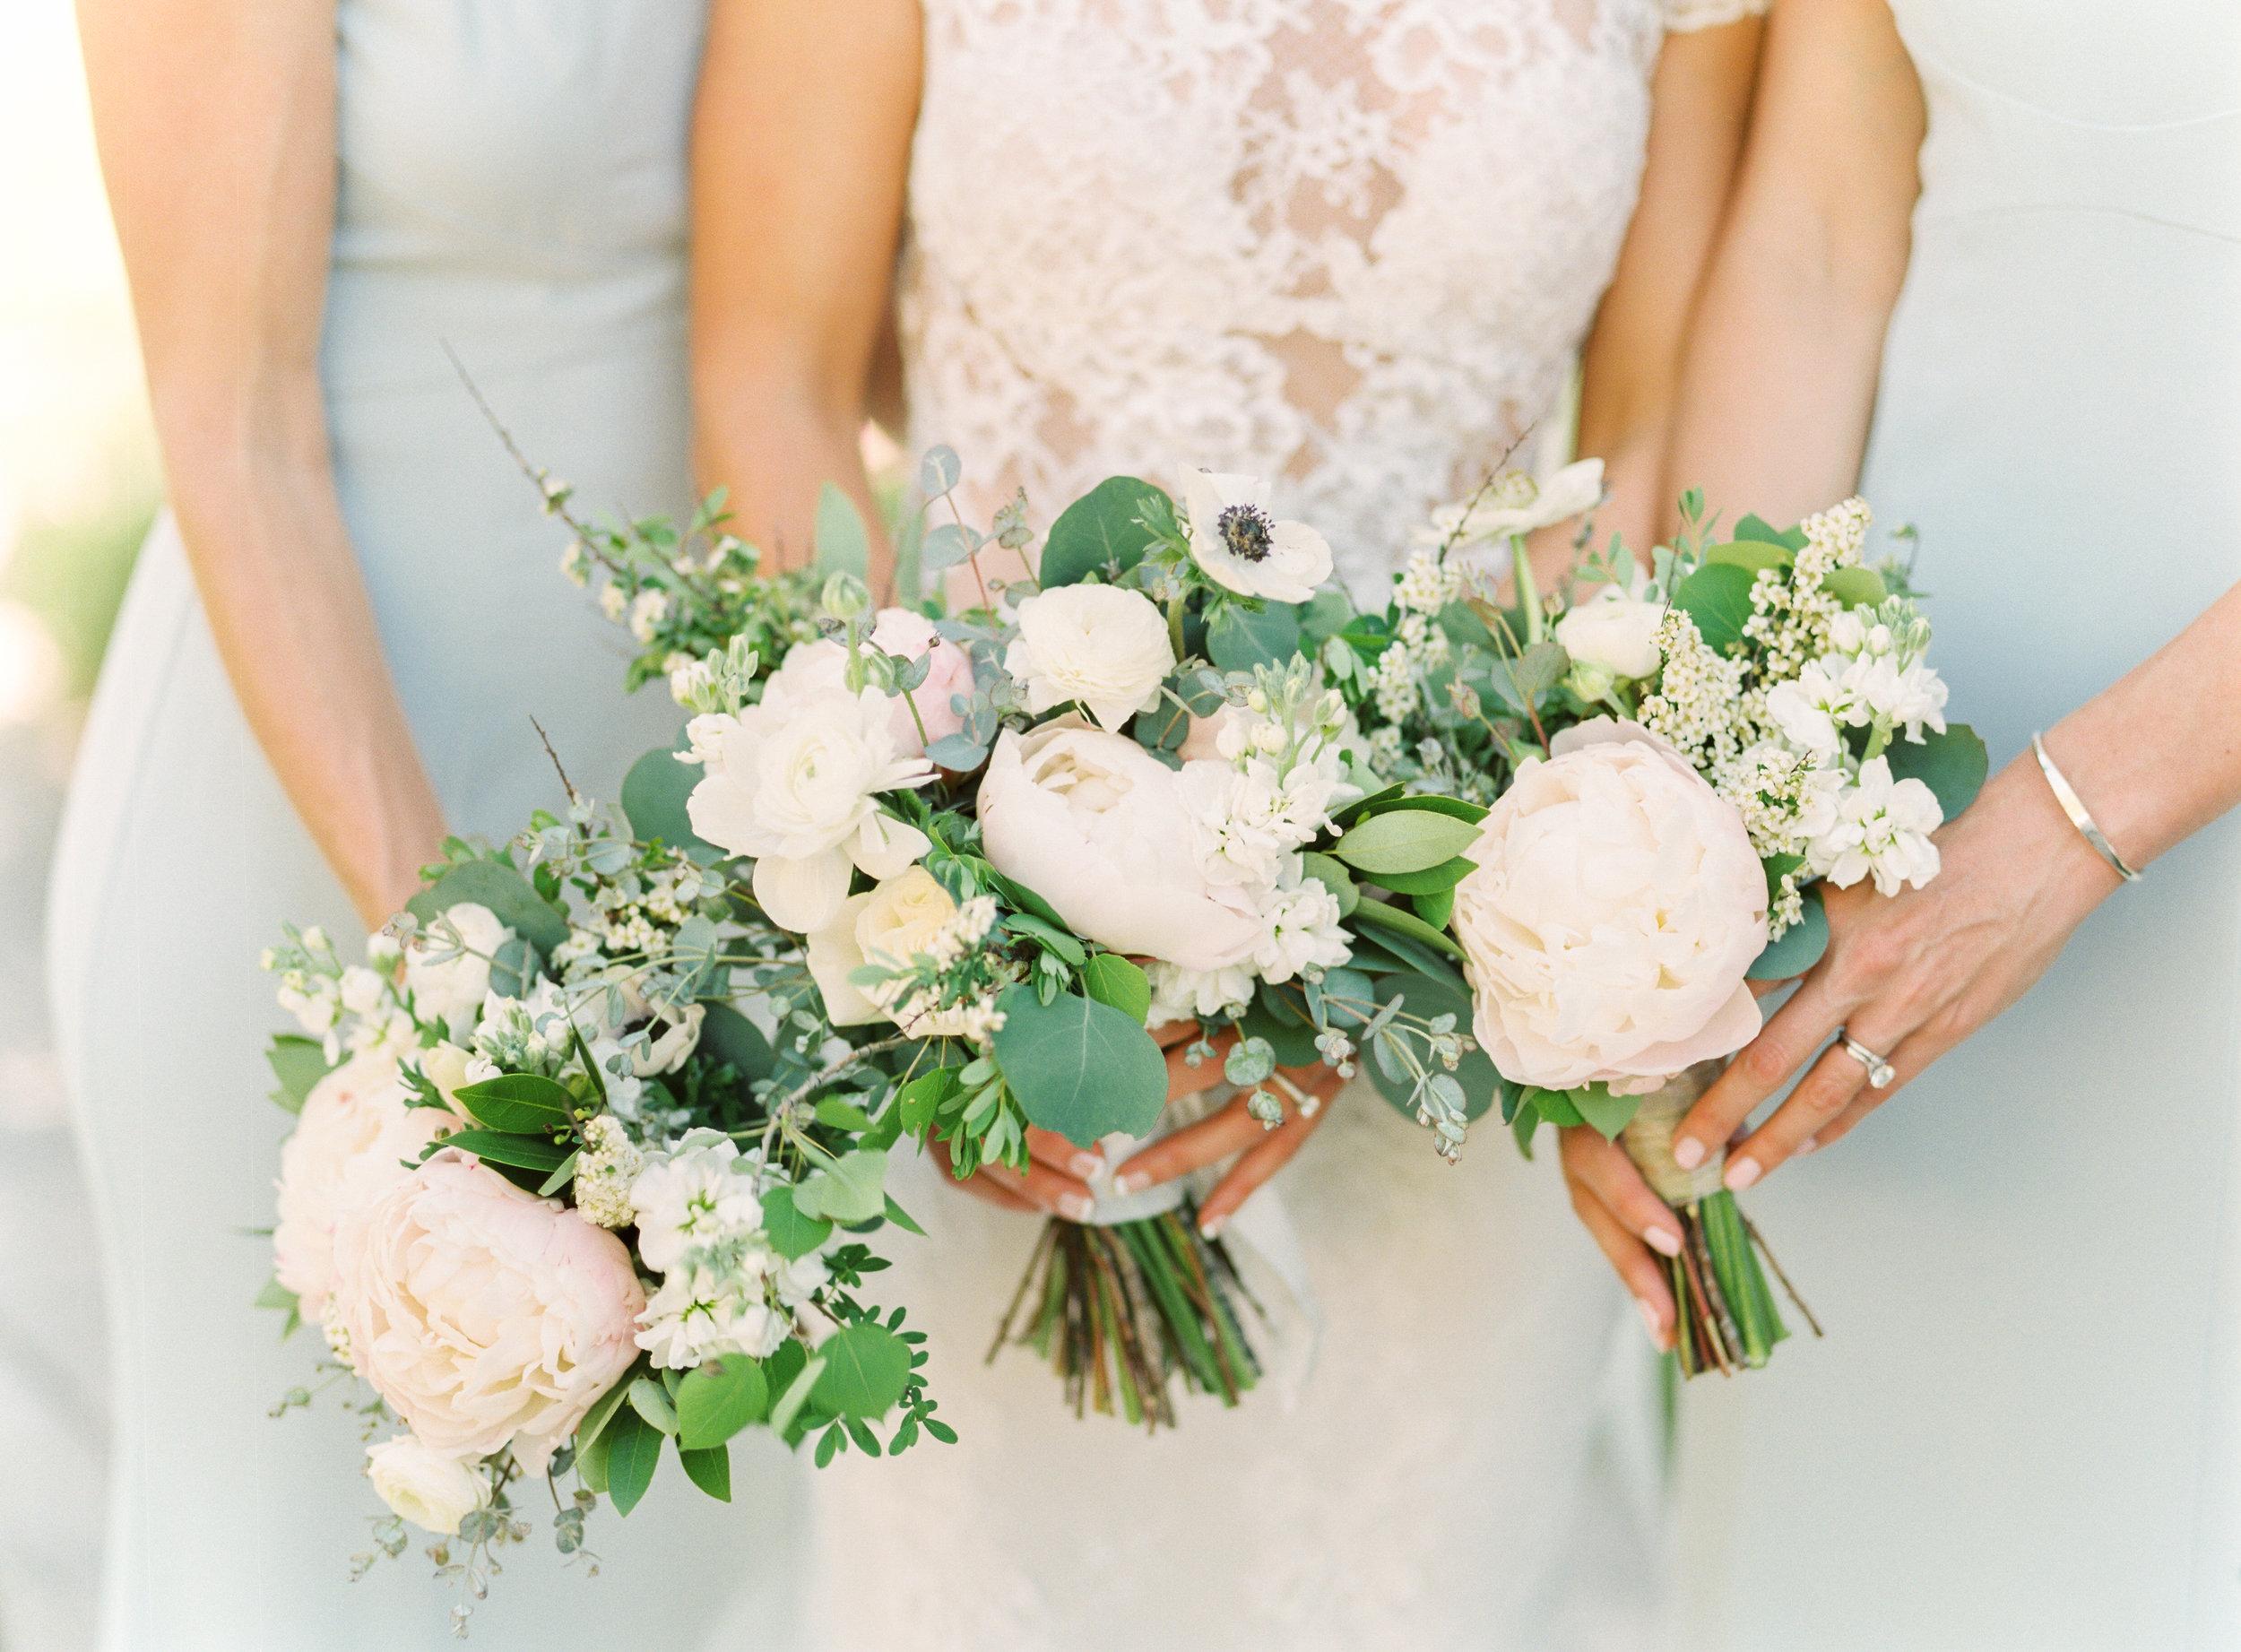 Kathryn-Allen-Boulder-wedding-2018-by-Lisa-ODwyer-198.jpg